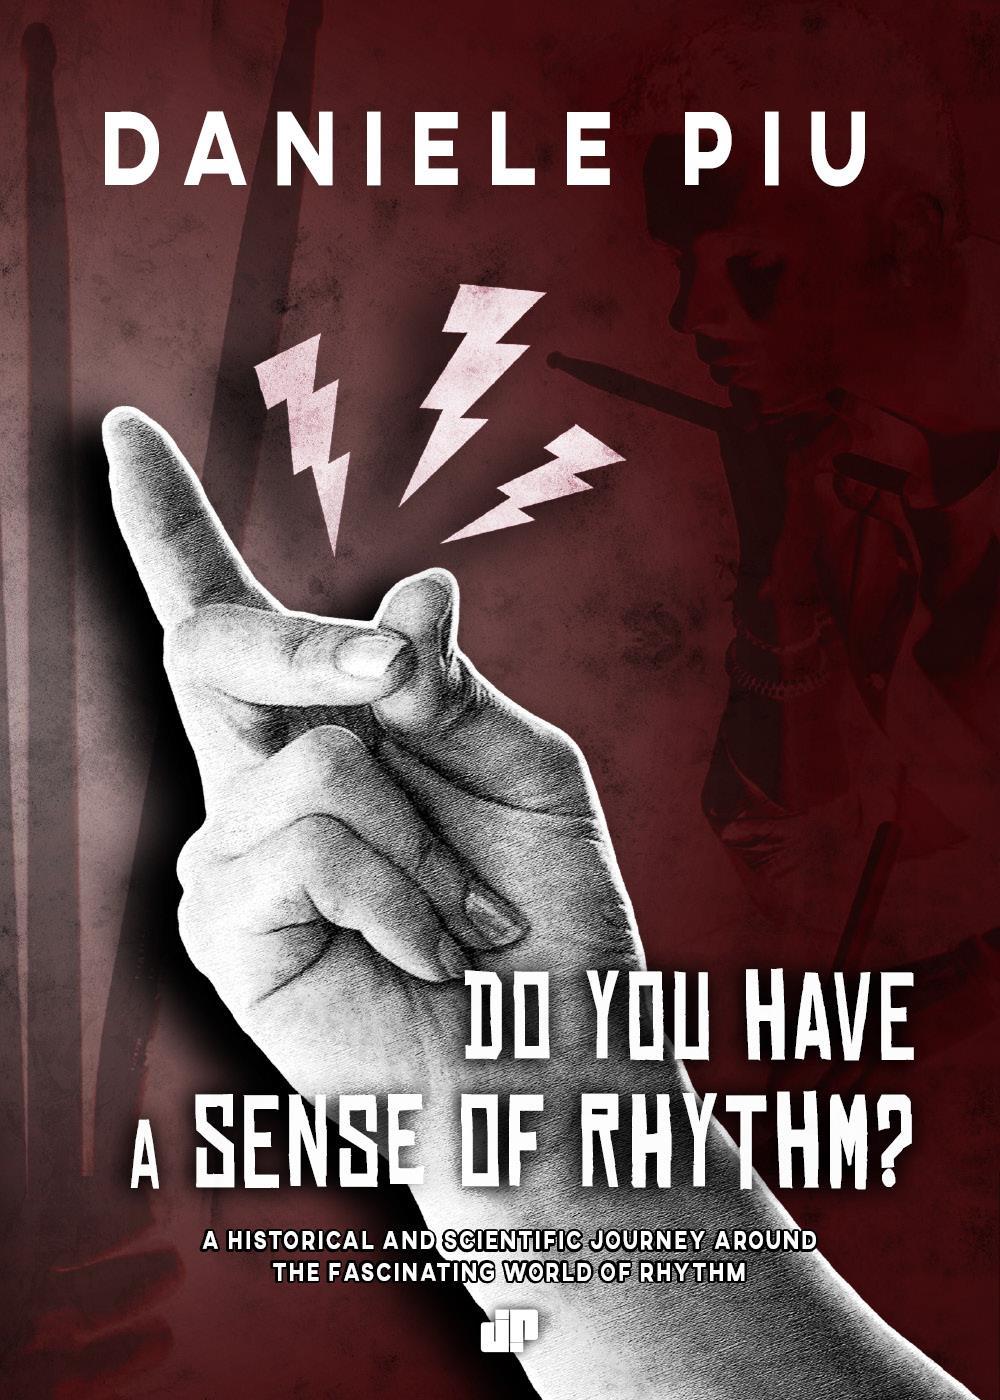 Do you have a sense of rhythm?